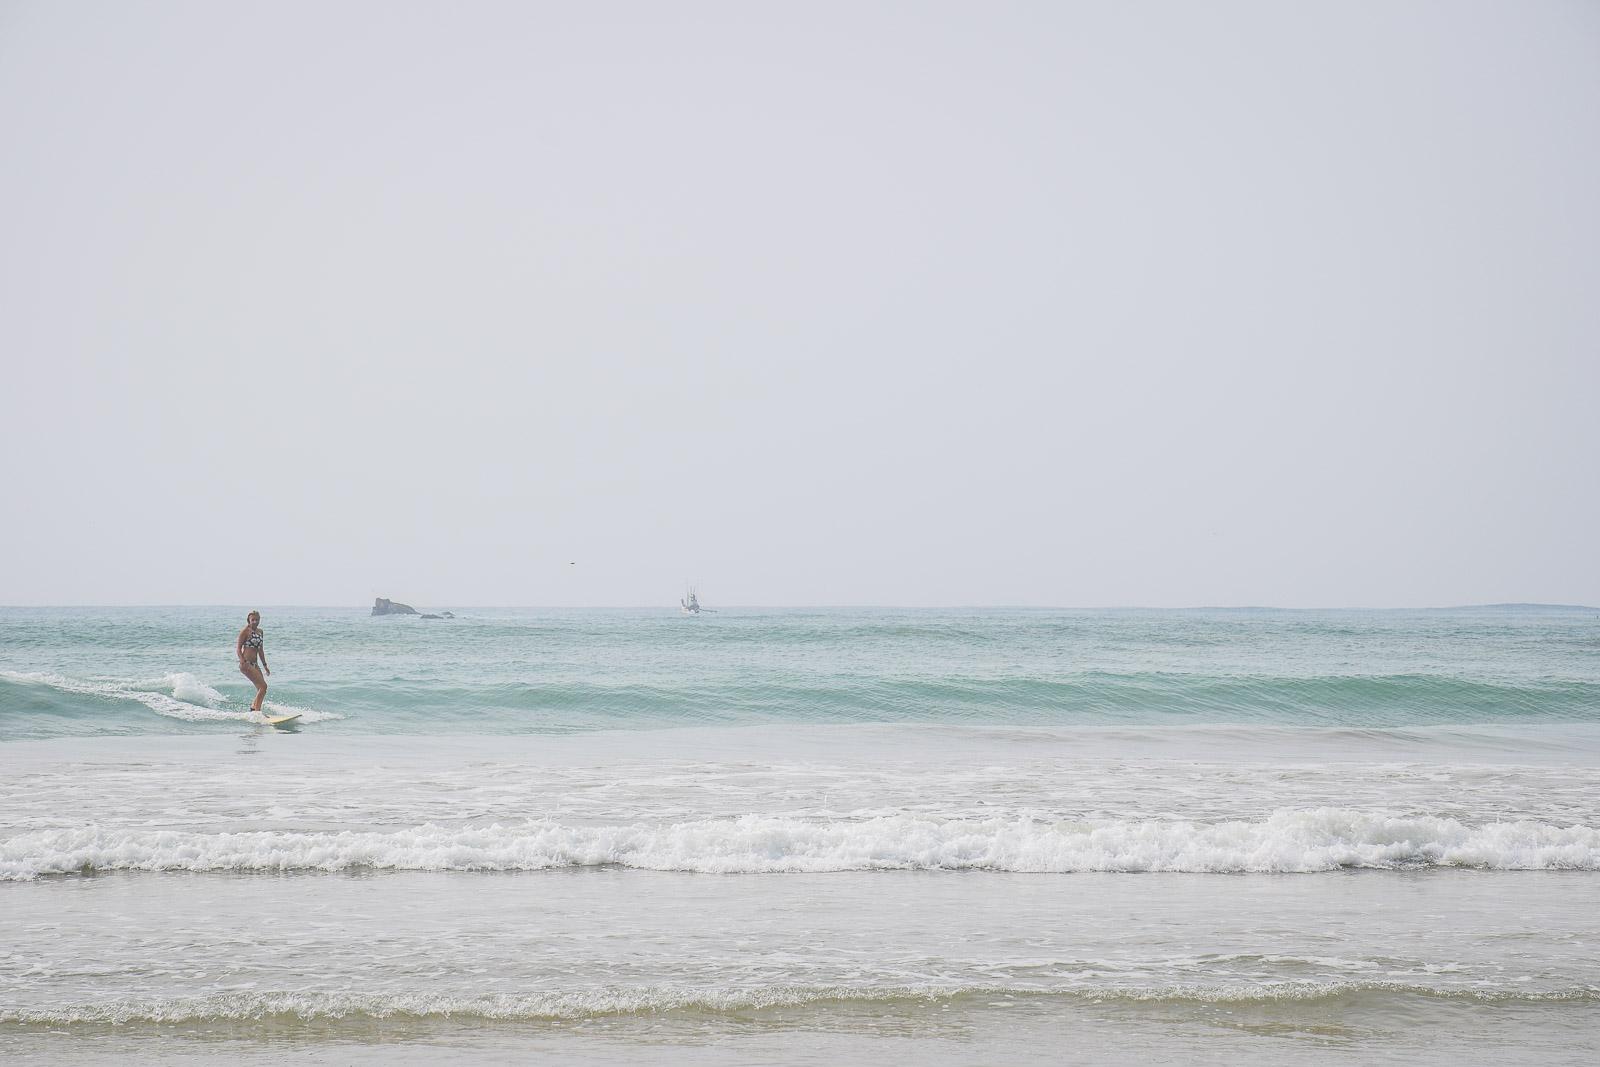 sunshinestories-surf-travel-blog-dsc_0080